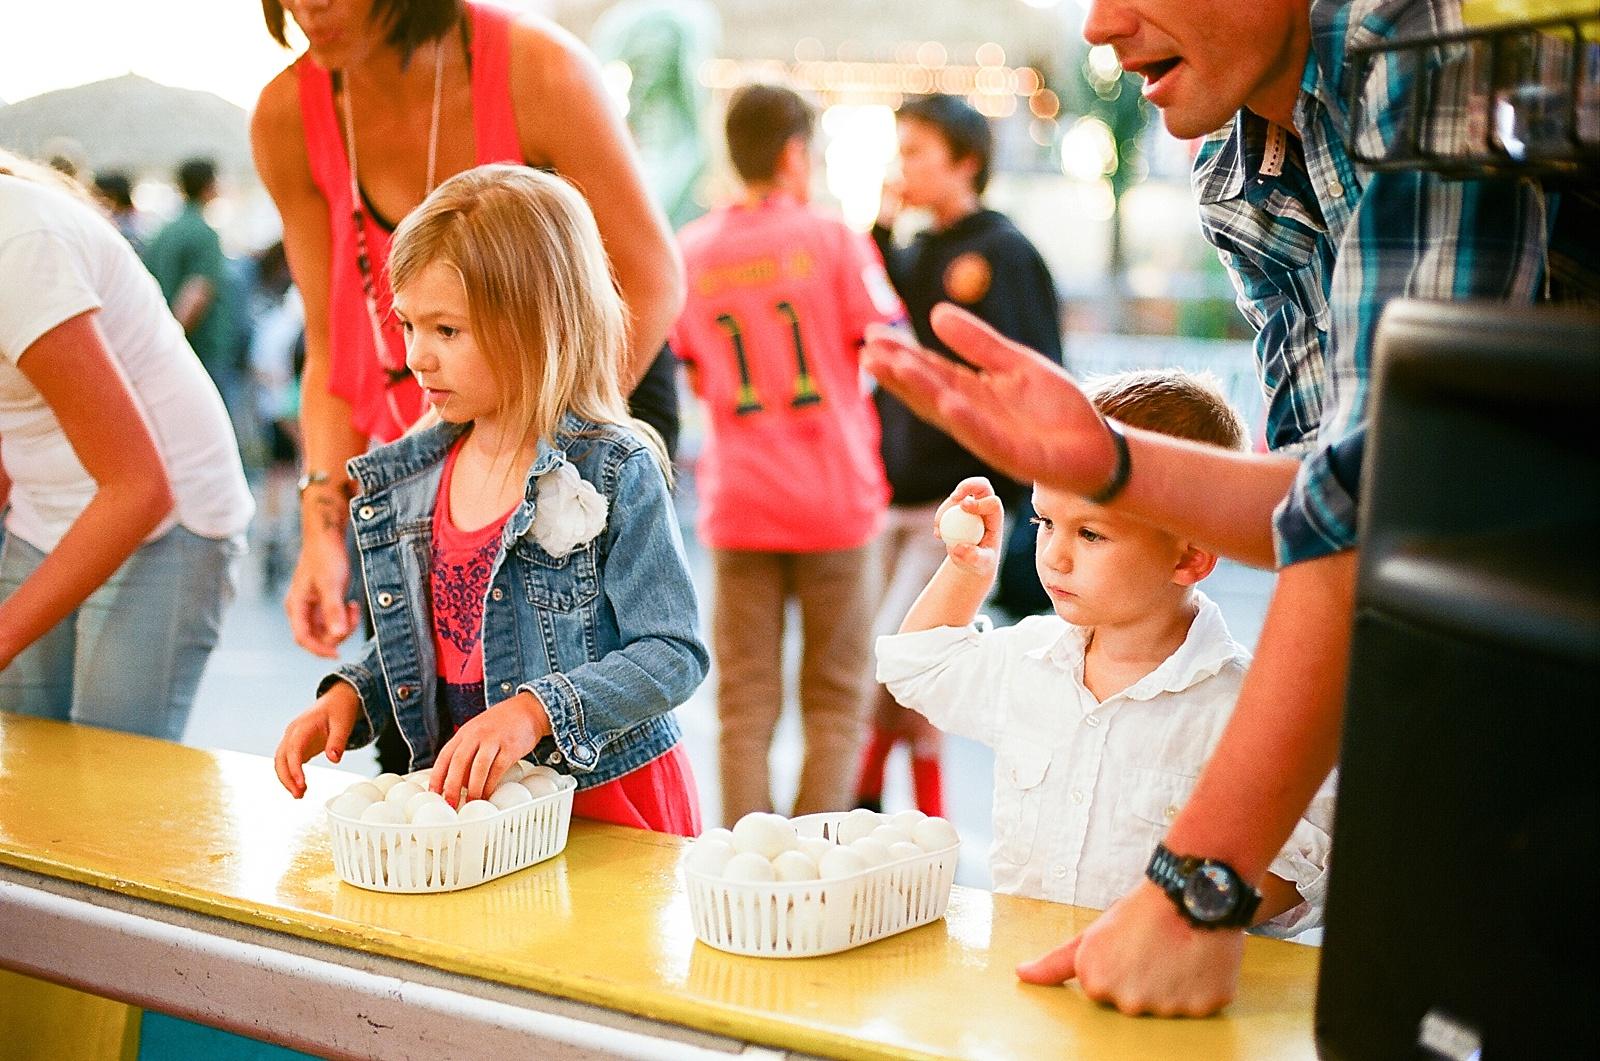 Family photo fun at the San Diego County Fair by family photographer Lauren Nygard